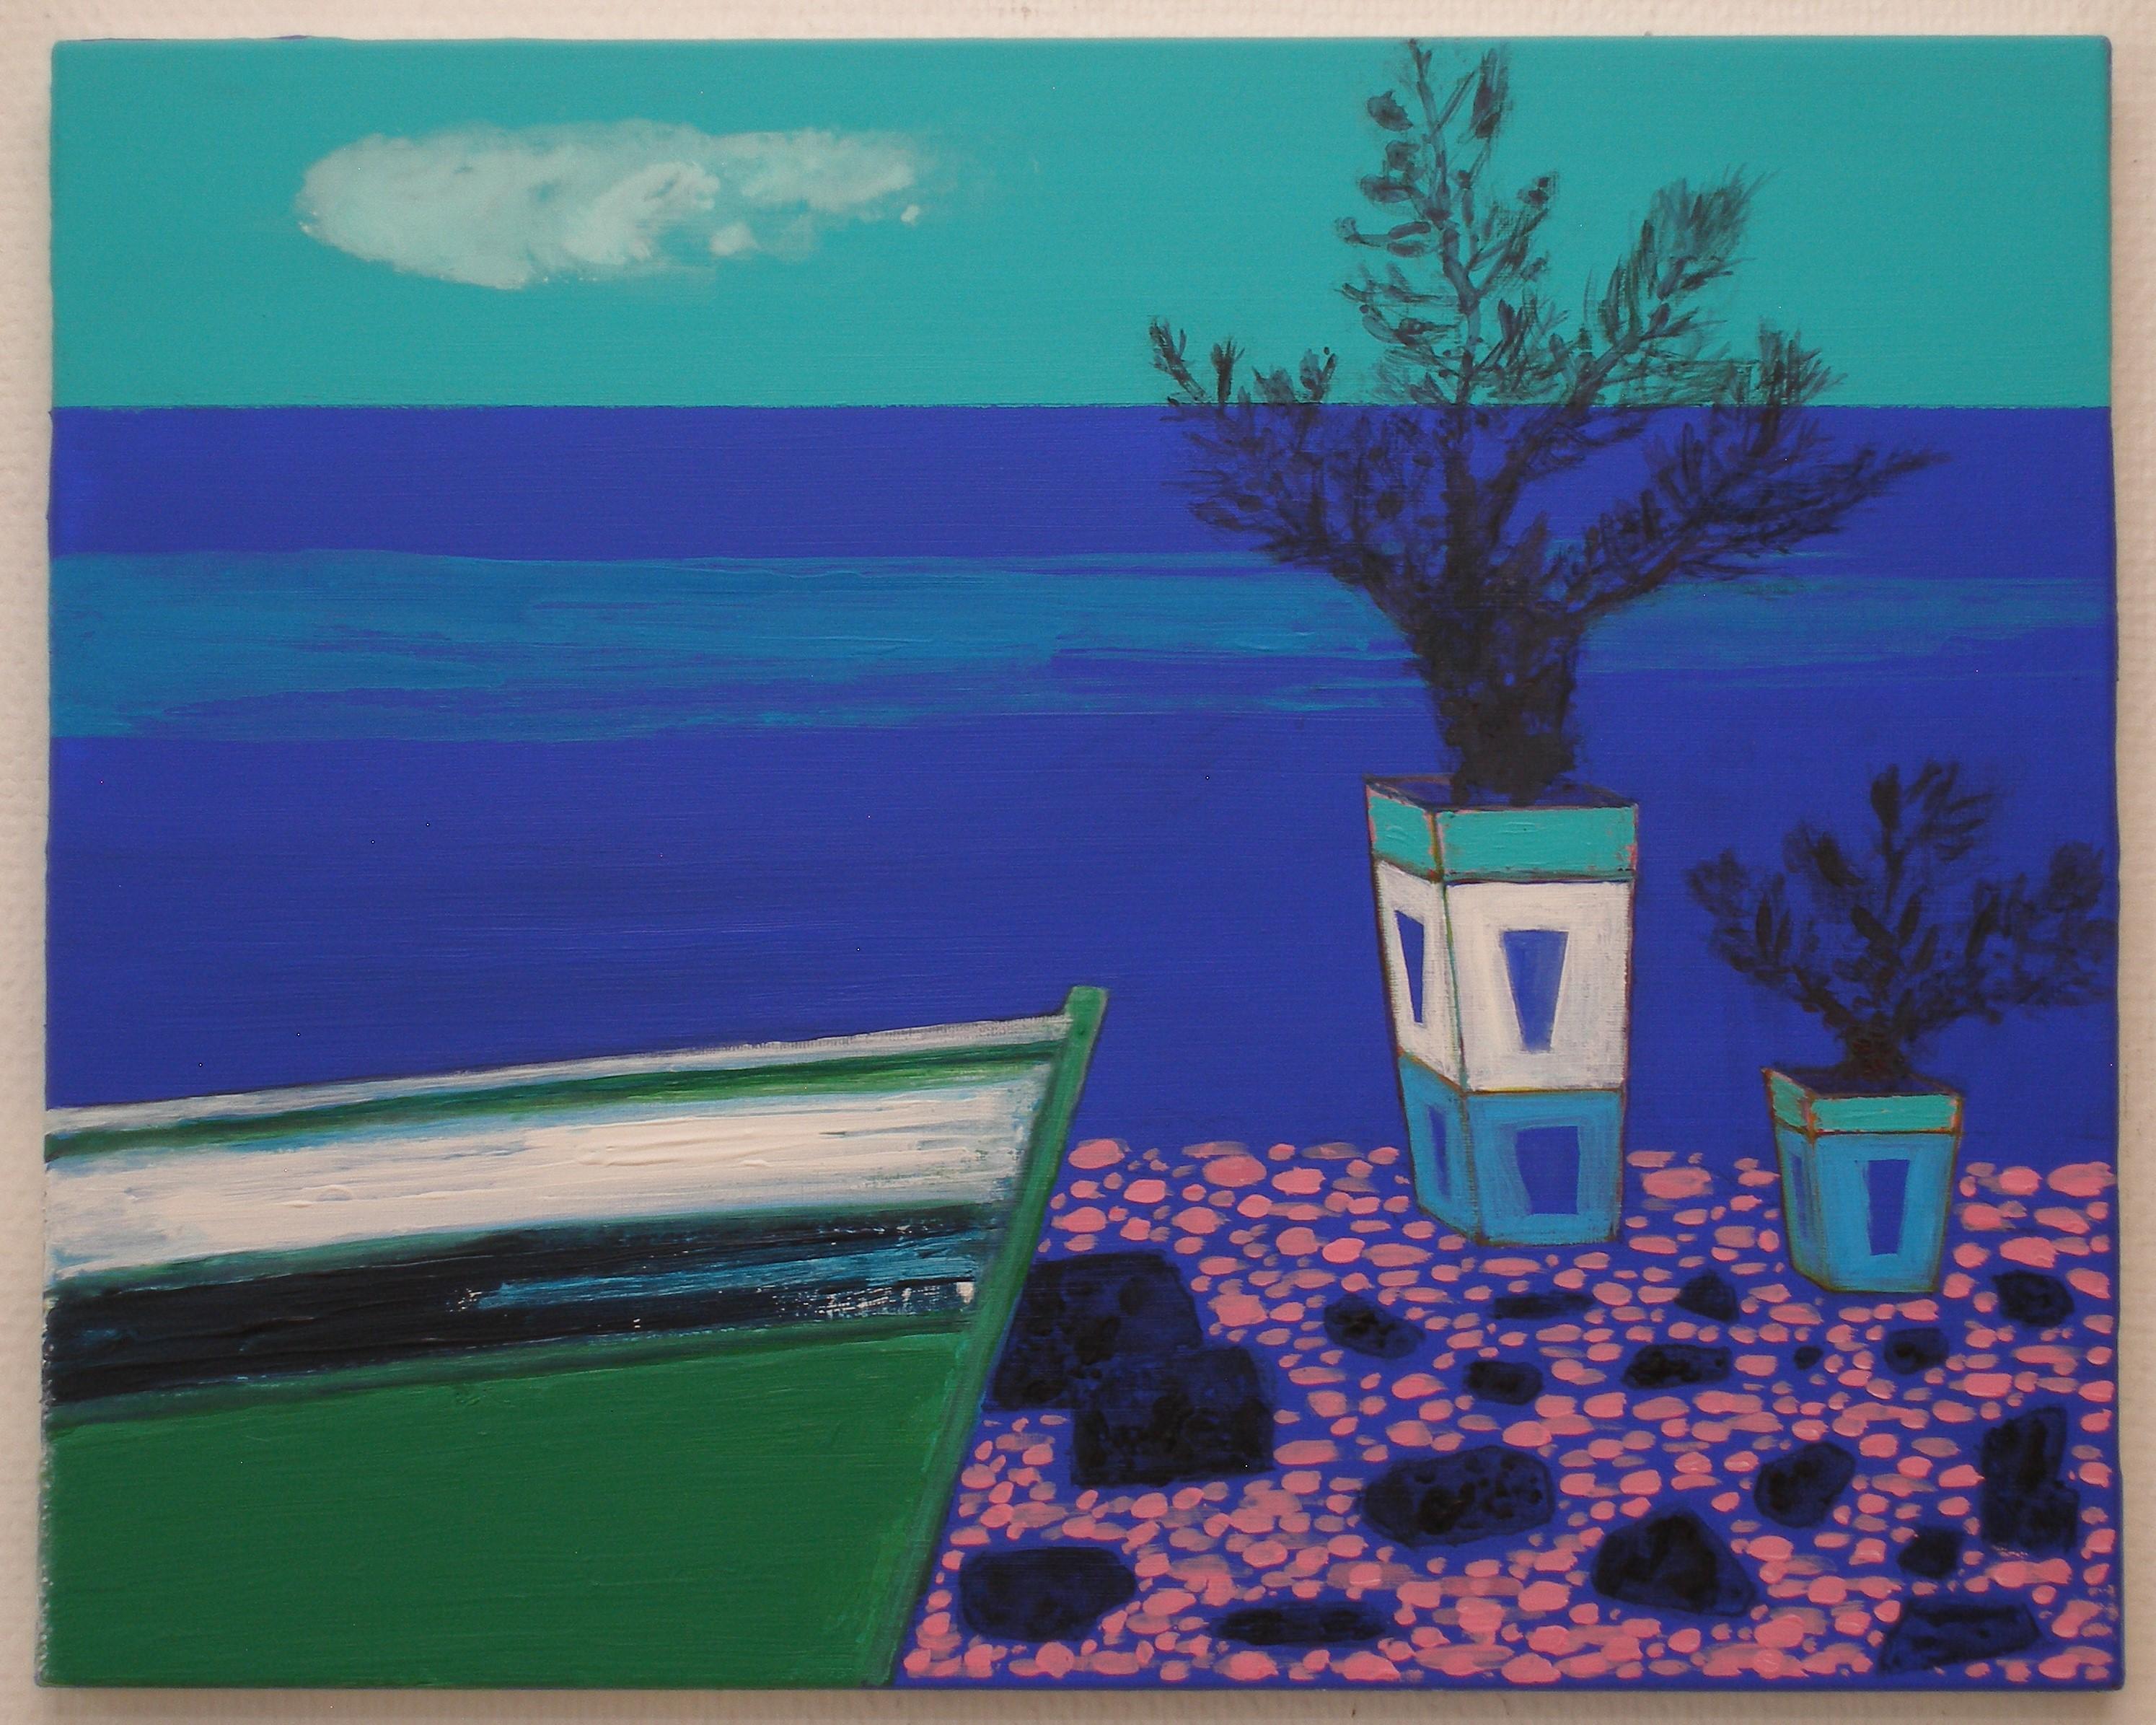 Shoreline 1, acrylic on canvas, 40x50cm